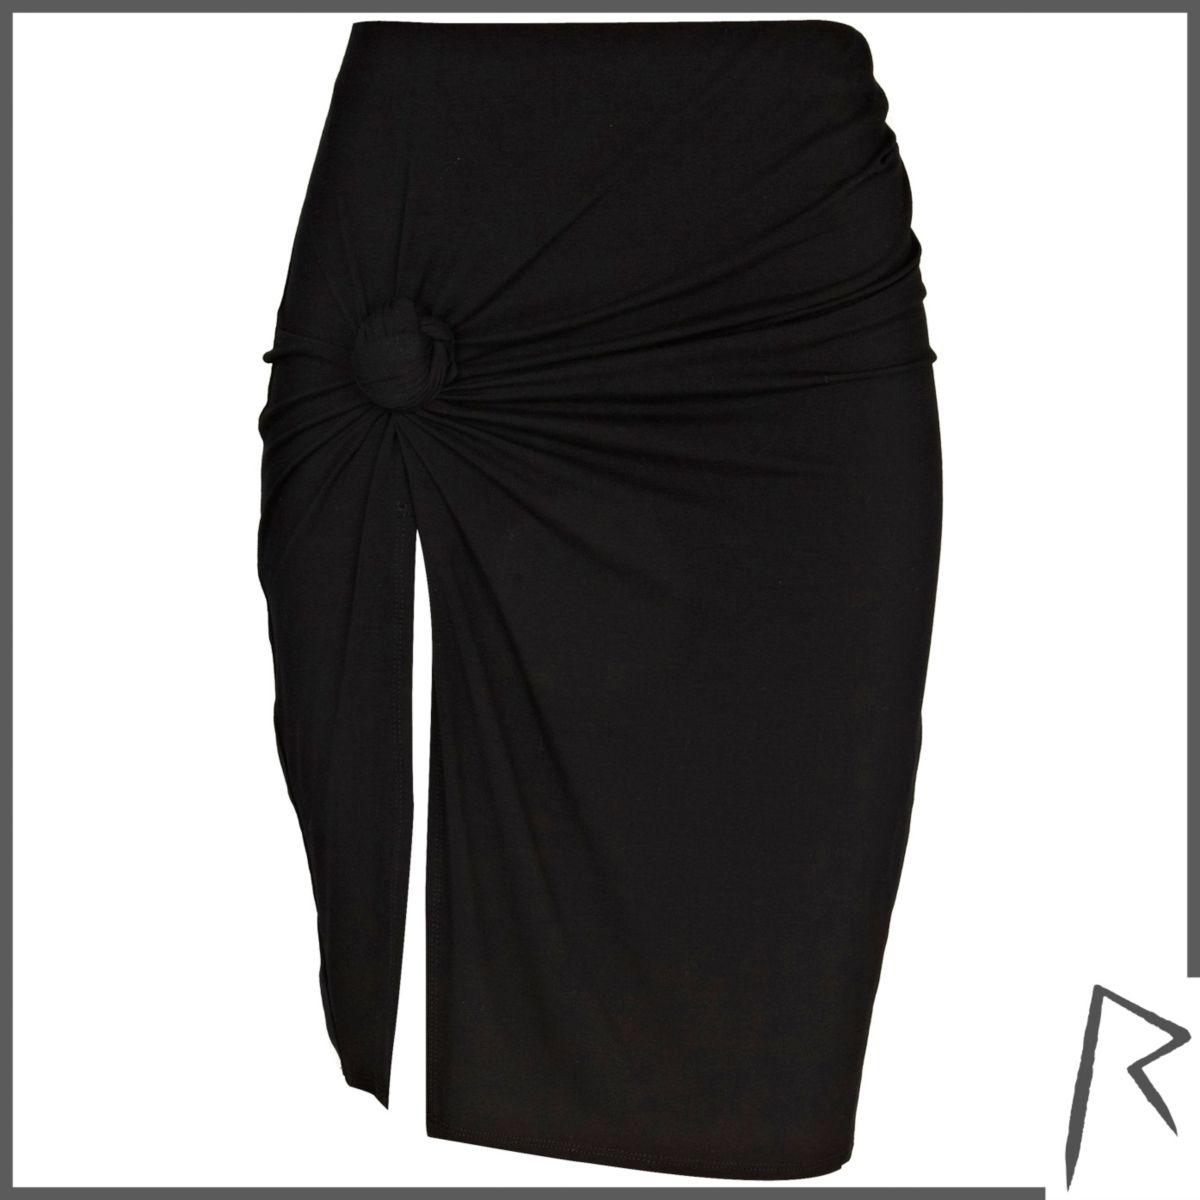 Black Rihanna knot front thigh split skirt